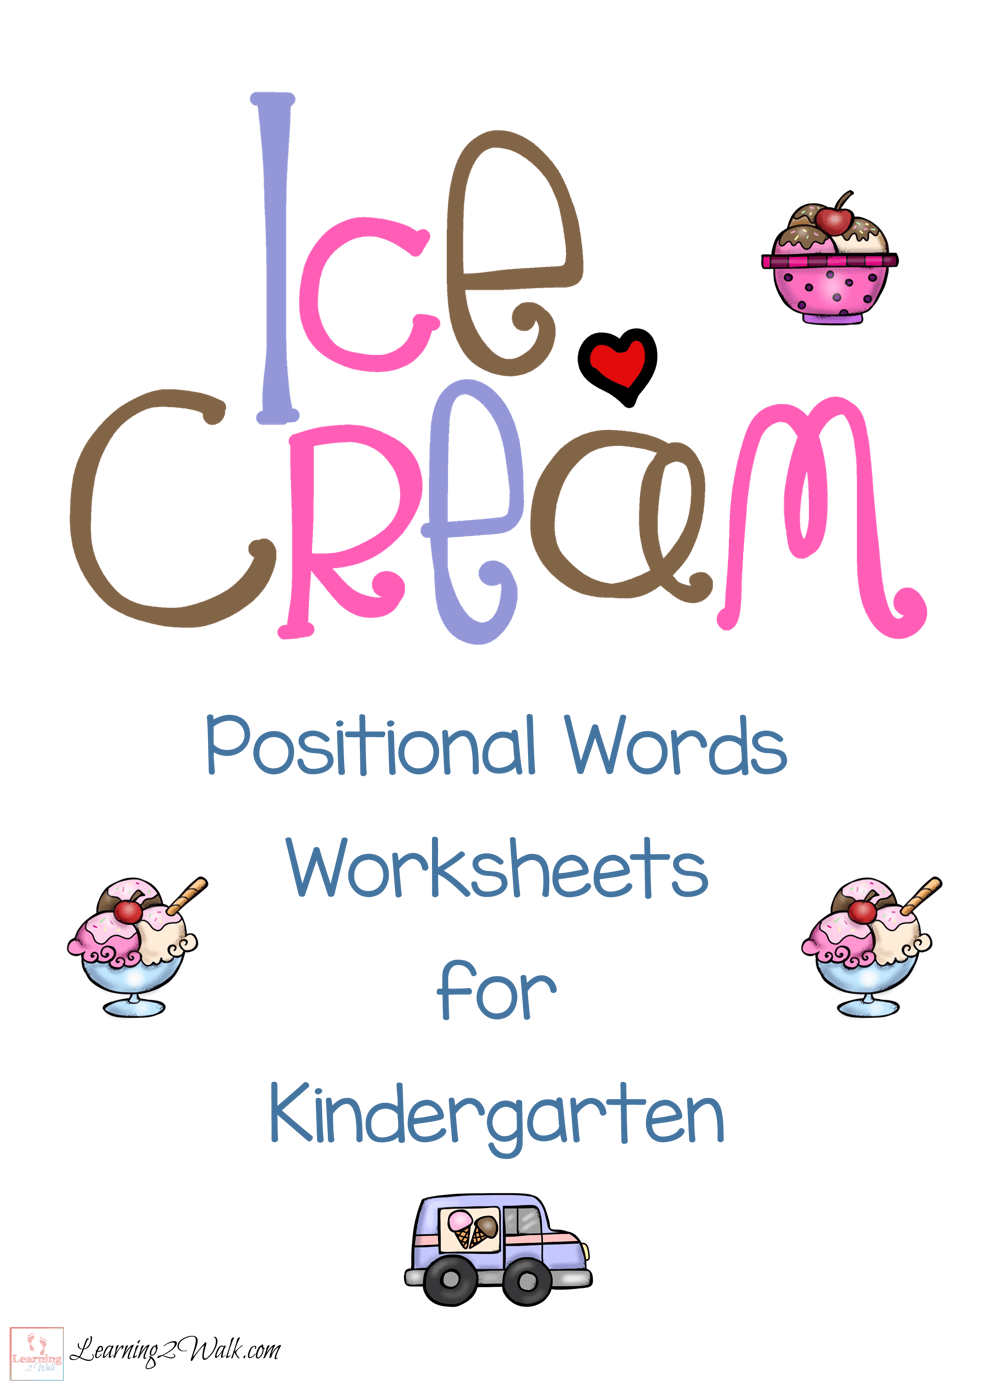 Ice Cream Positional Words Worksheets for Kindergarten | Pinterest